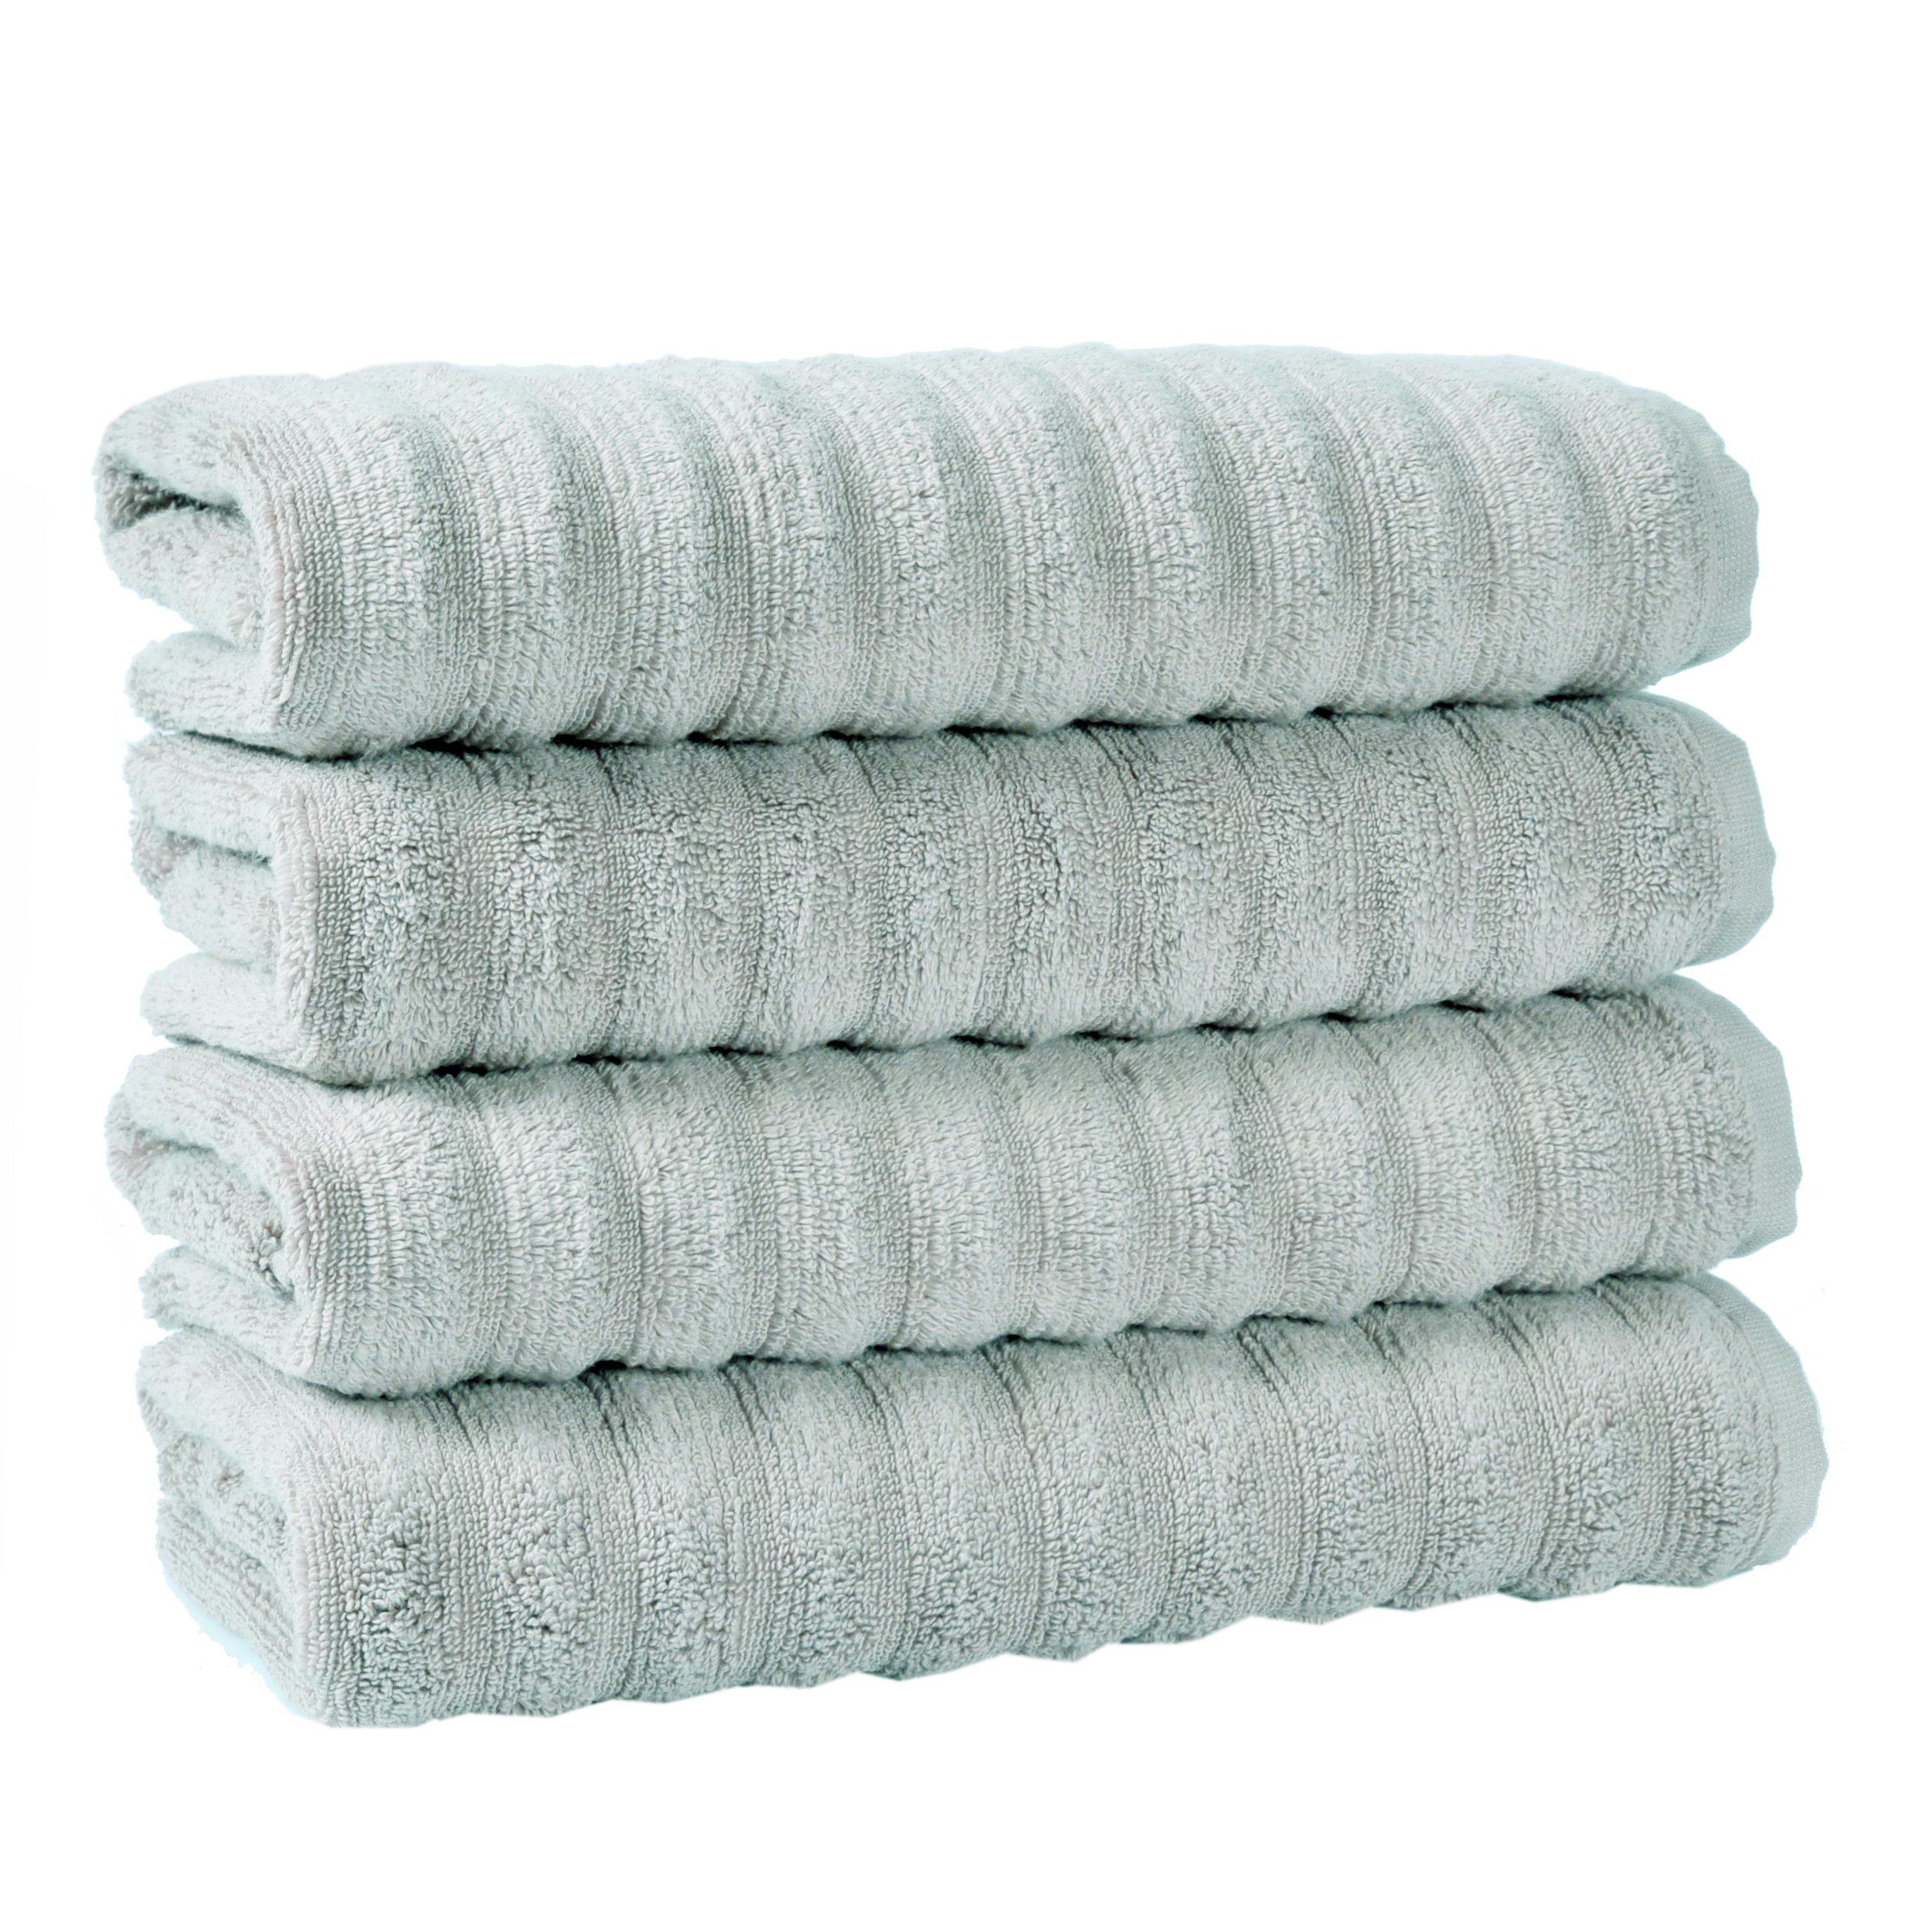 Premium Luxury Hotel & Spa Turkish Cotton Key West Towel Set 28x55 inch (4 Piece) (Seafoam)